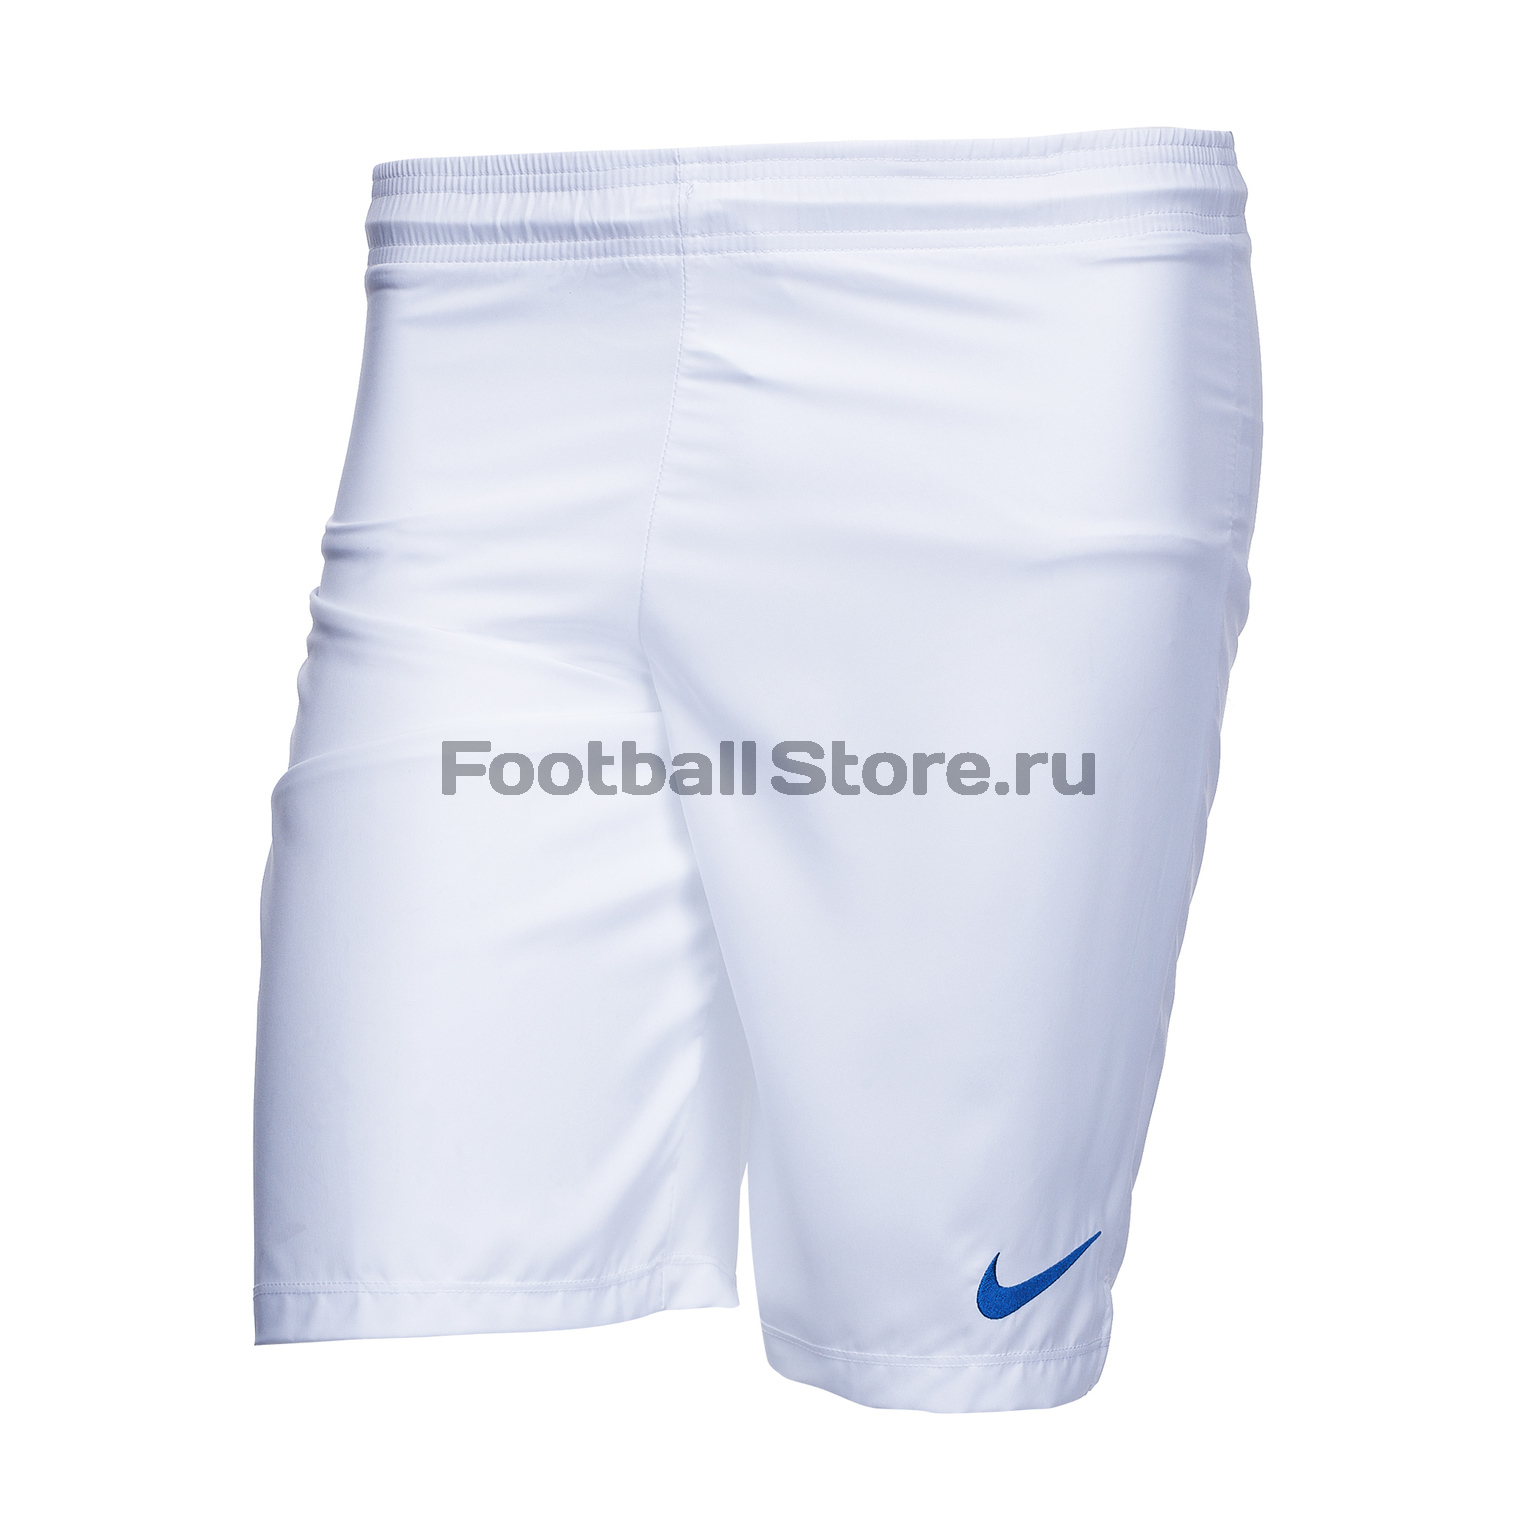 Шорты Nike Laser Woven III Short NB 725901-101